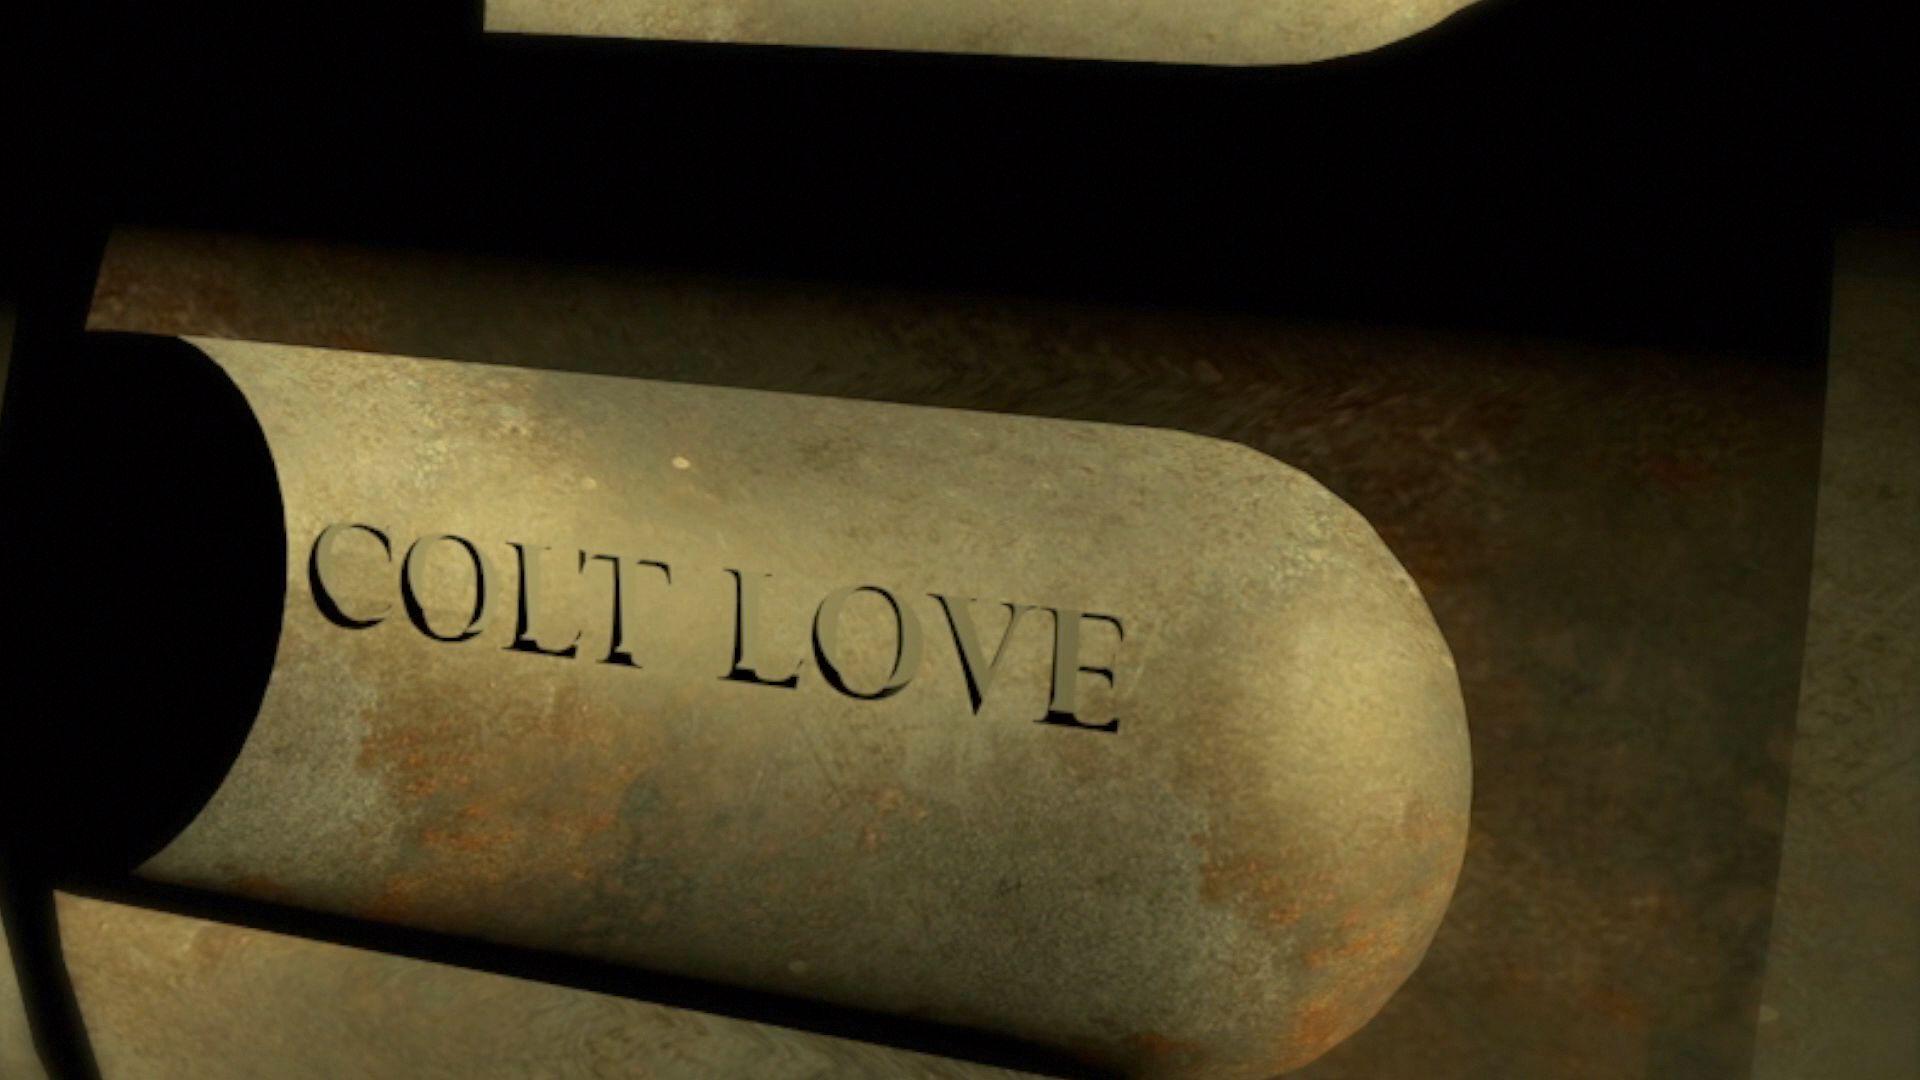 Colt Love